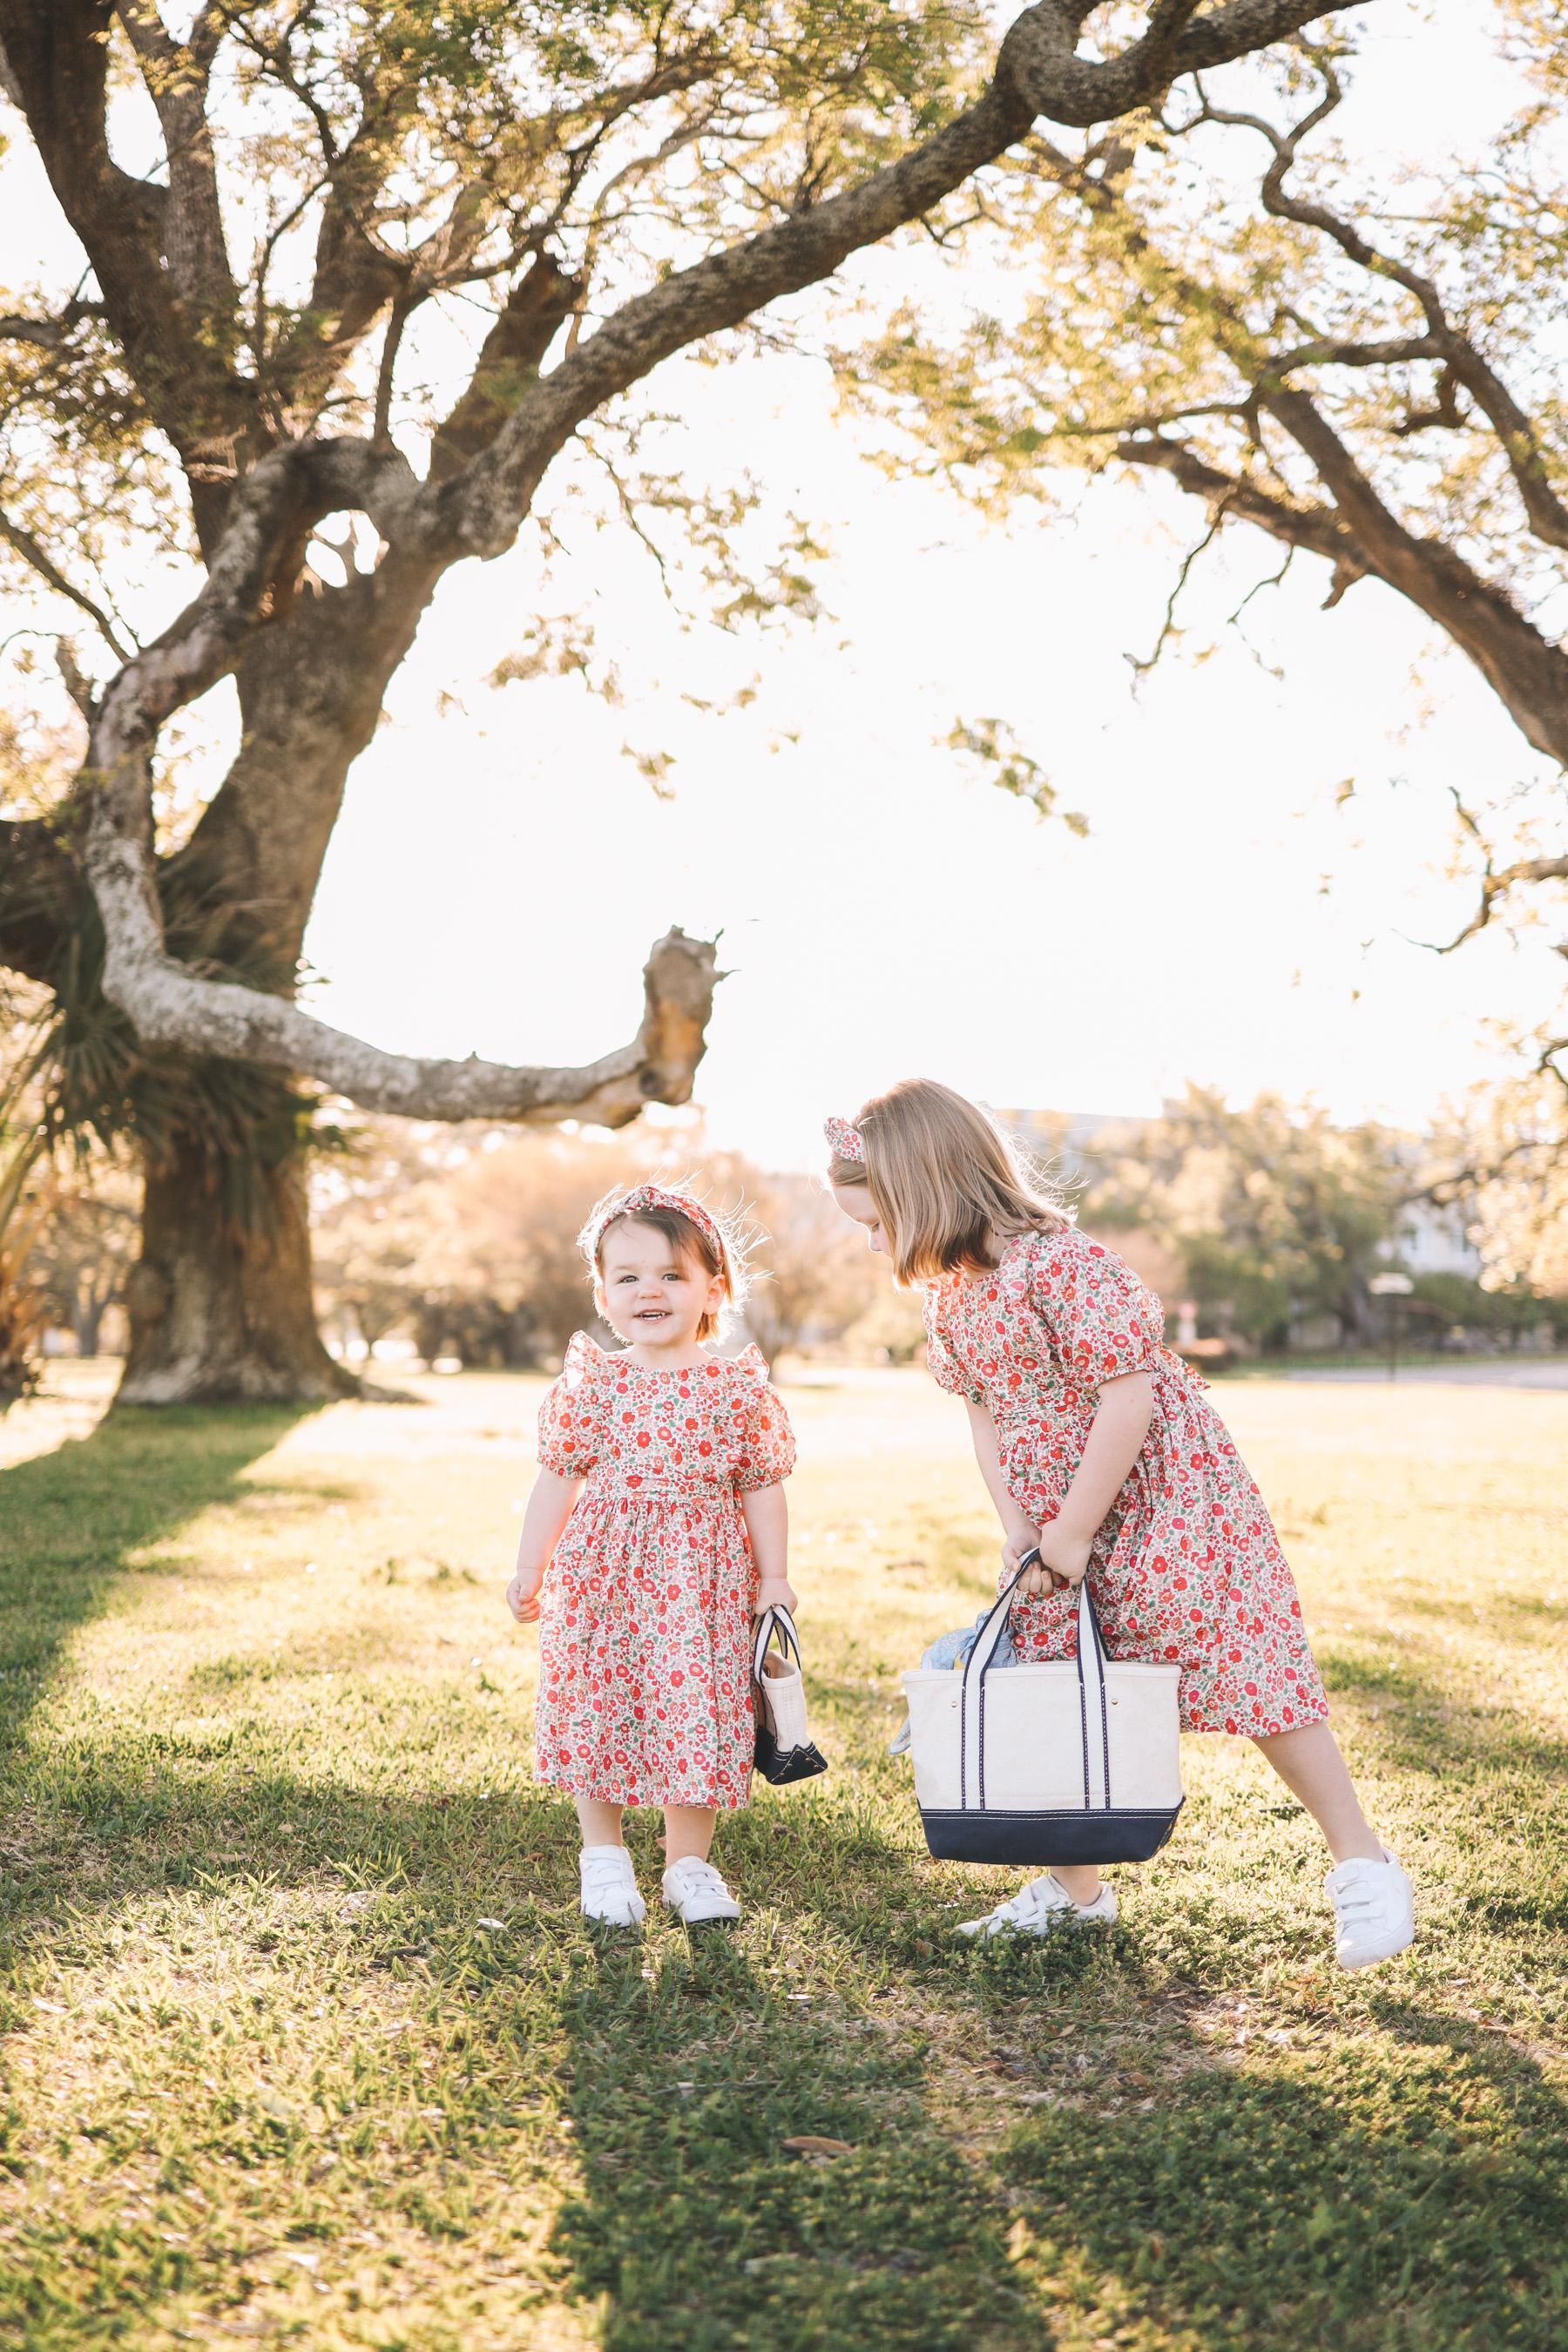 j.crew kids liberty dress | Under the Oak Trees